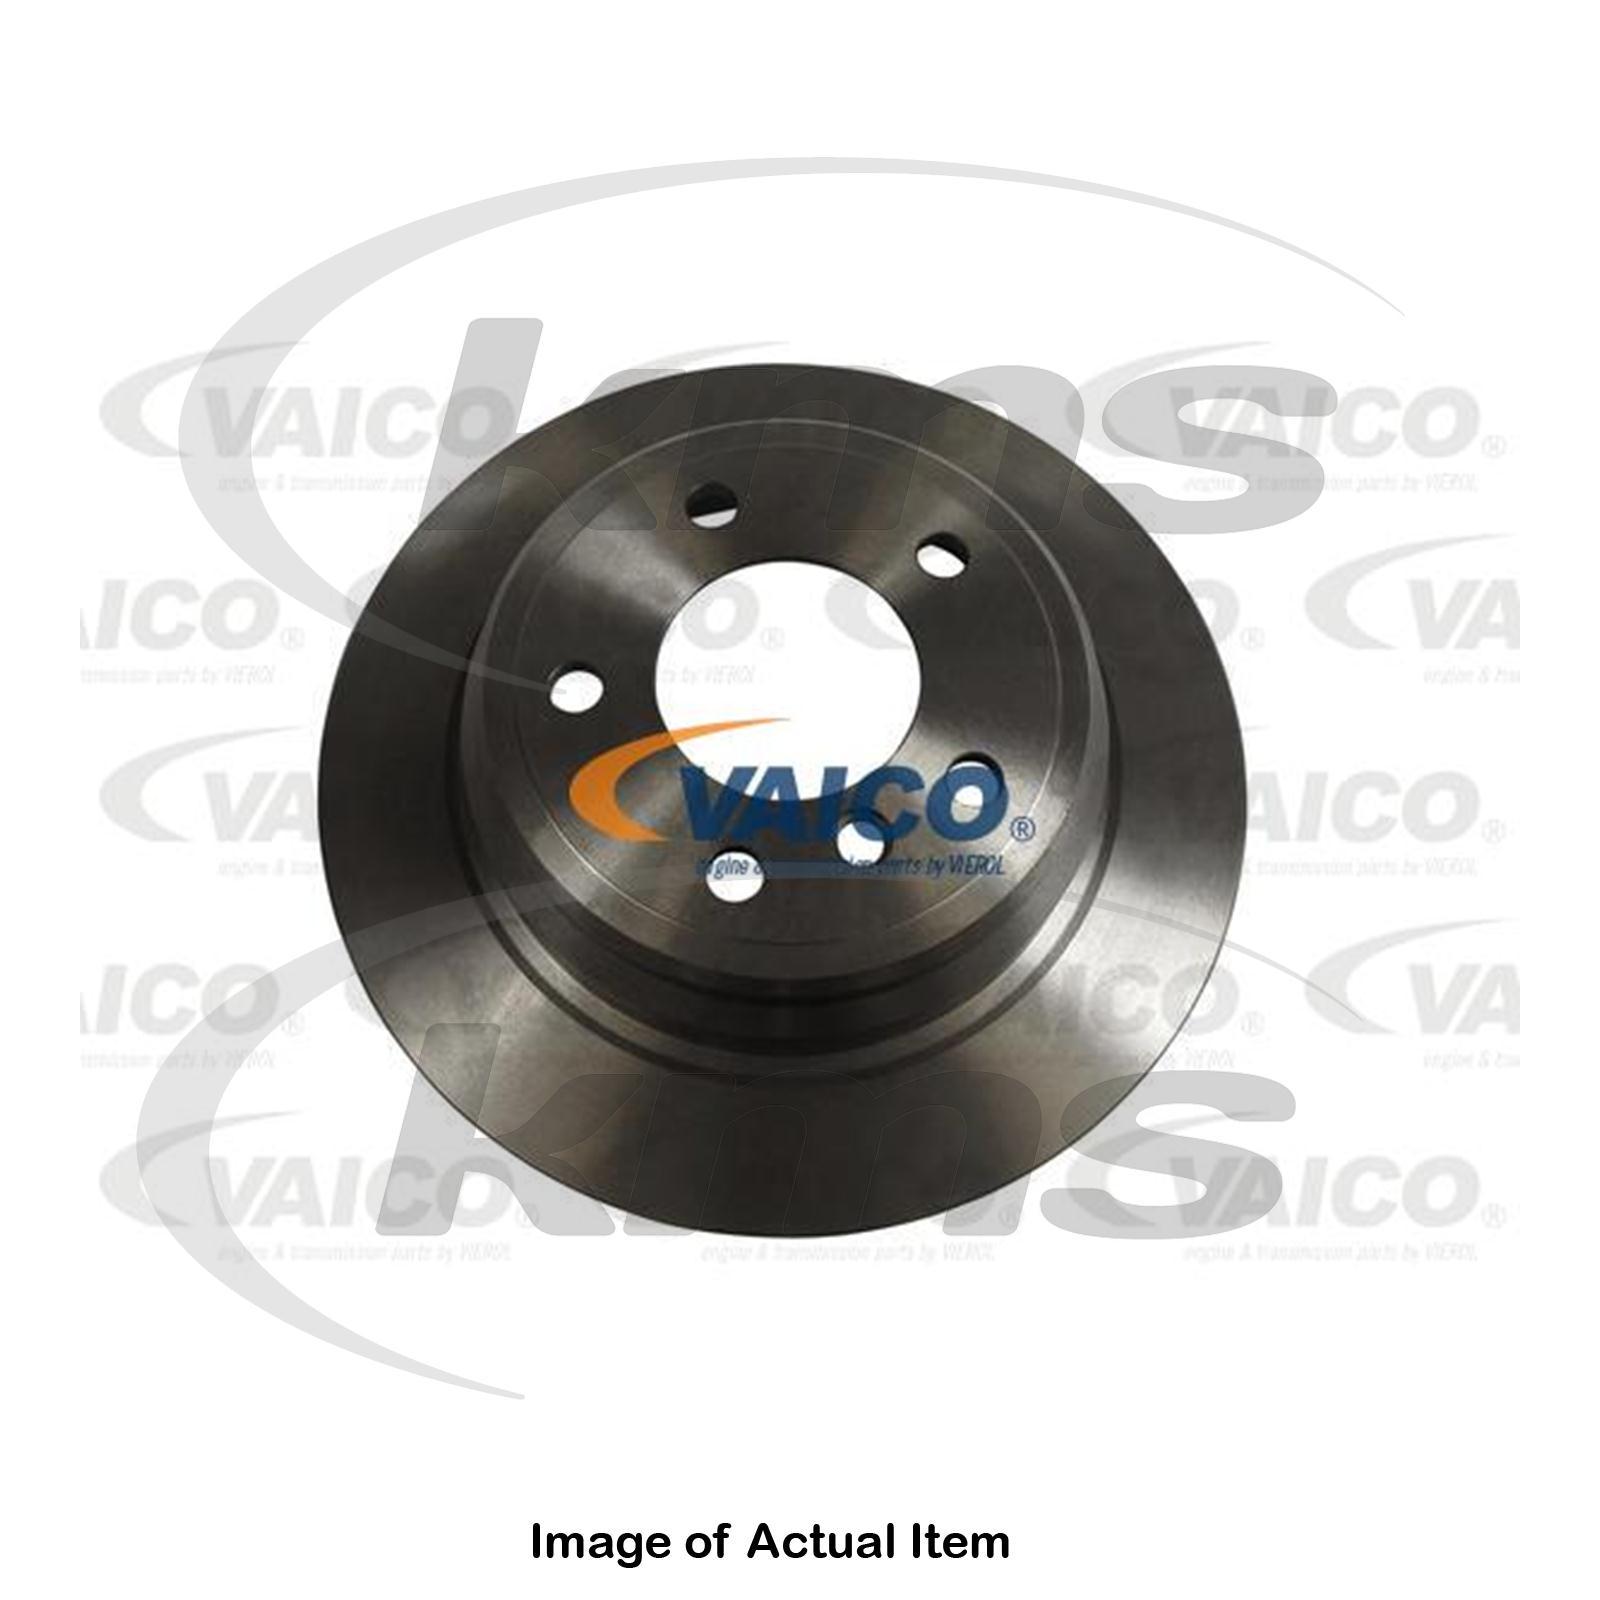 Brake Discs Axle Set 299mm Vented Chevrolet Opel Vauxhall Front Brake Pads